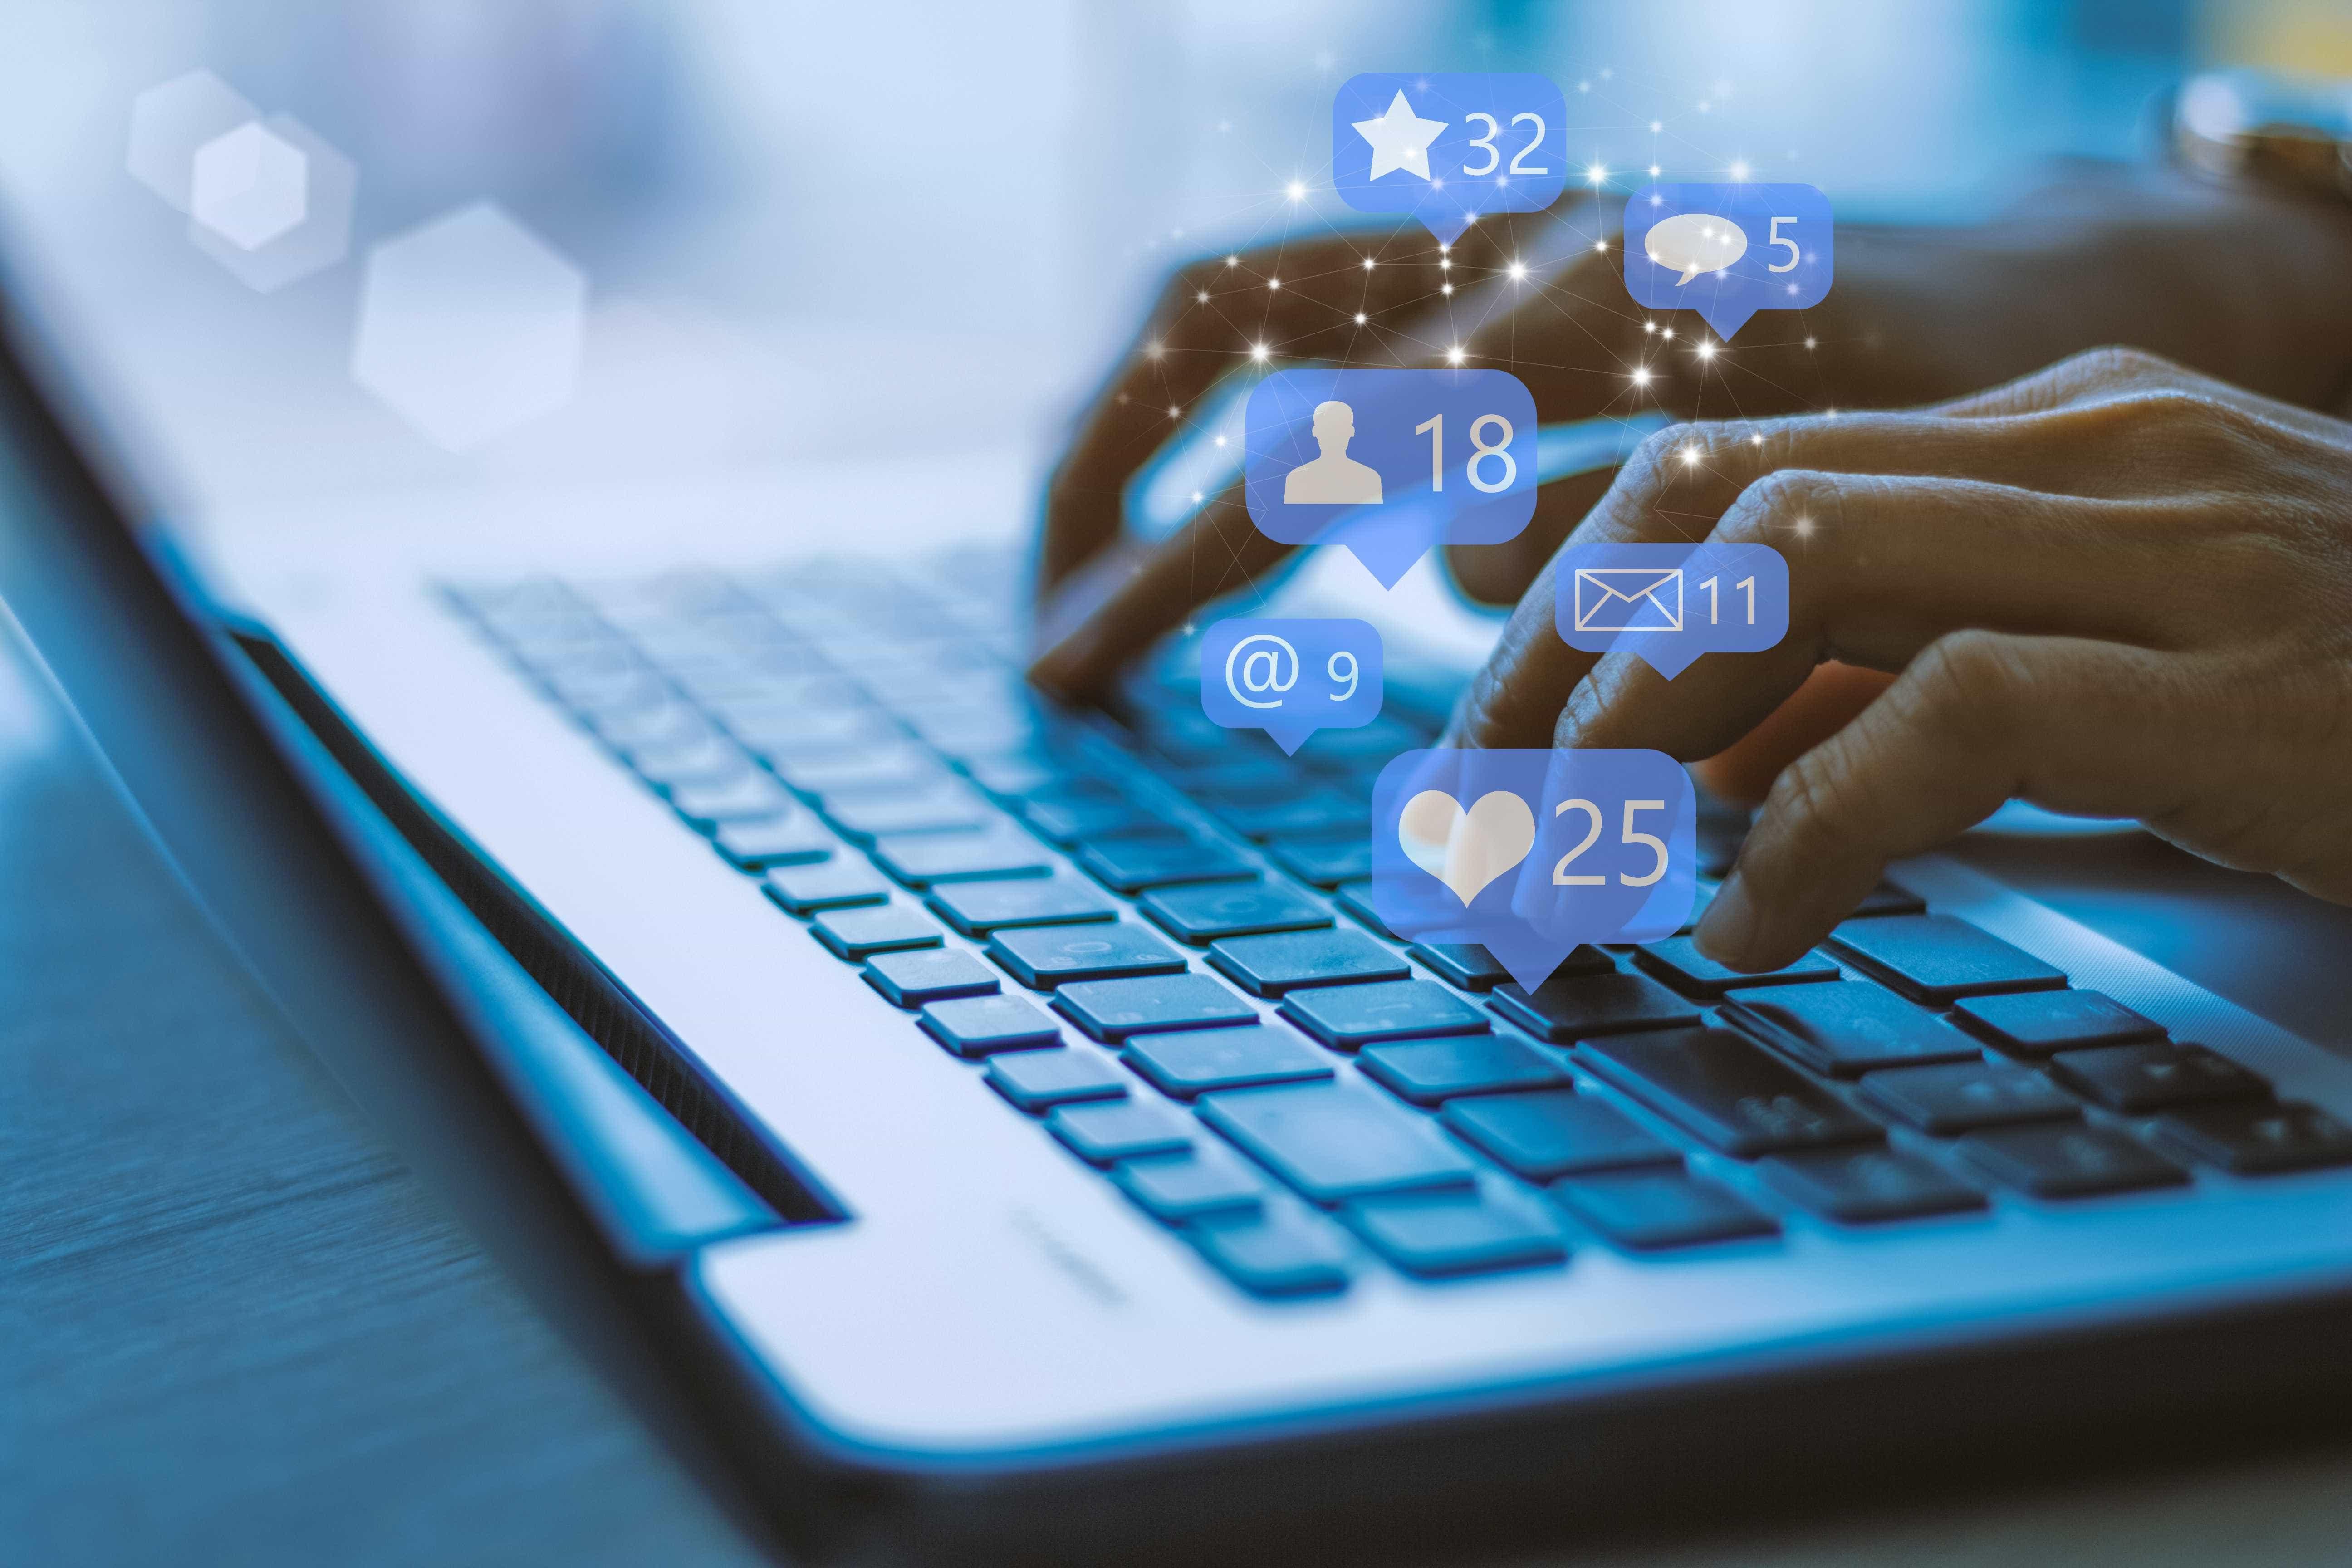 Europa quer que Facebook, Google e Twitter reforcem combate a fake news